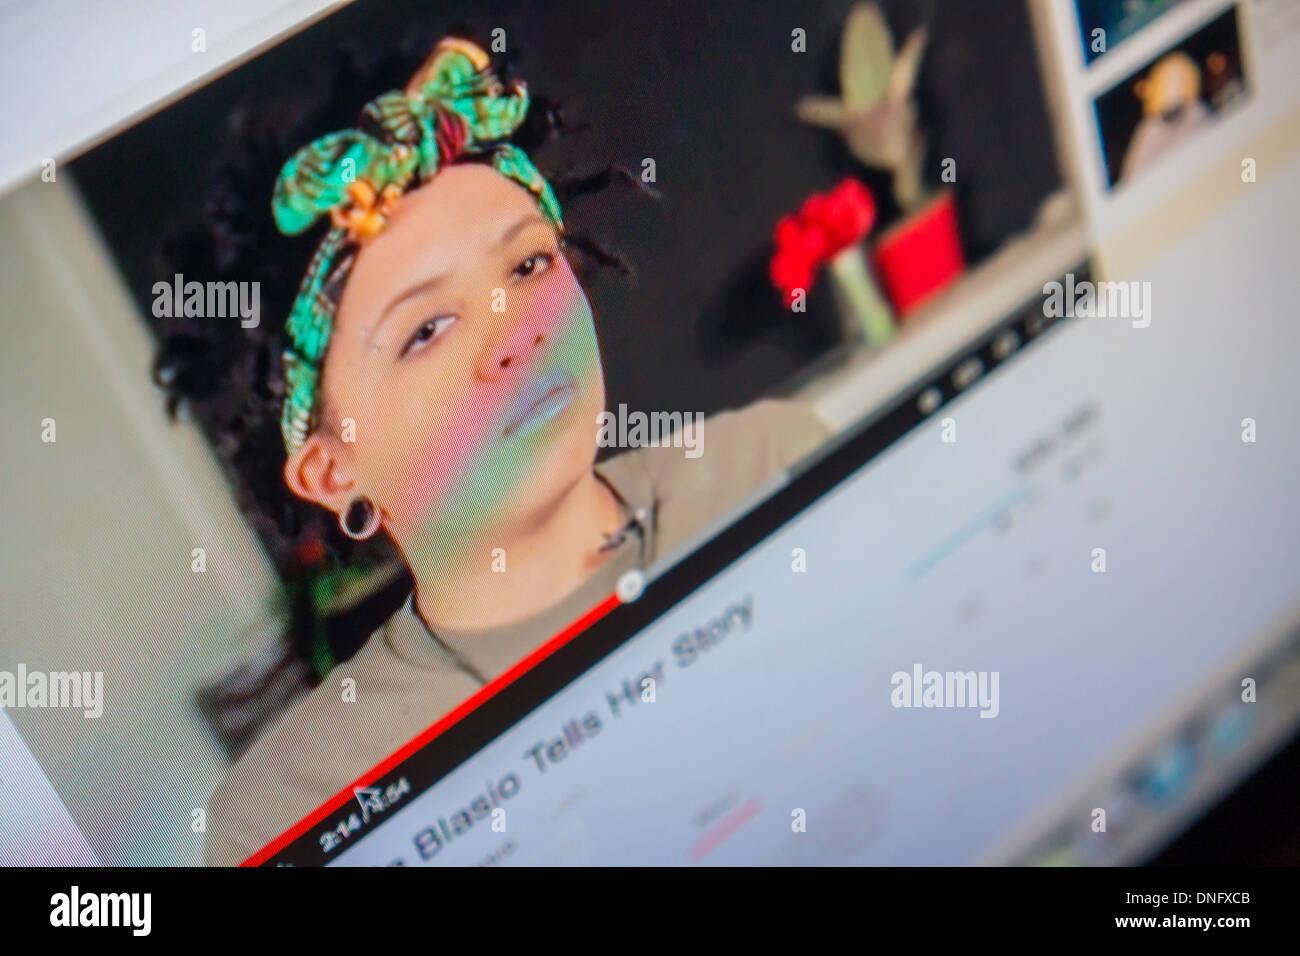 Chiara De Blasio, the 19-year old daughter of Mayor-elect Bill De Blasio,  is seen on her YouTube video